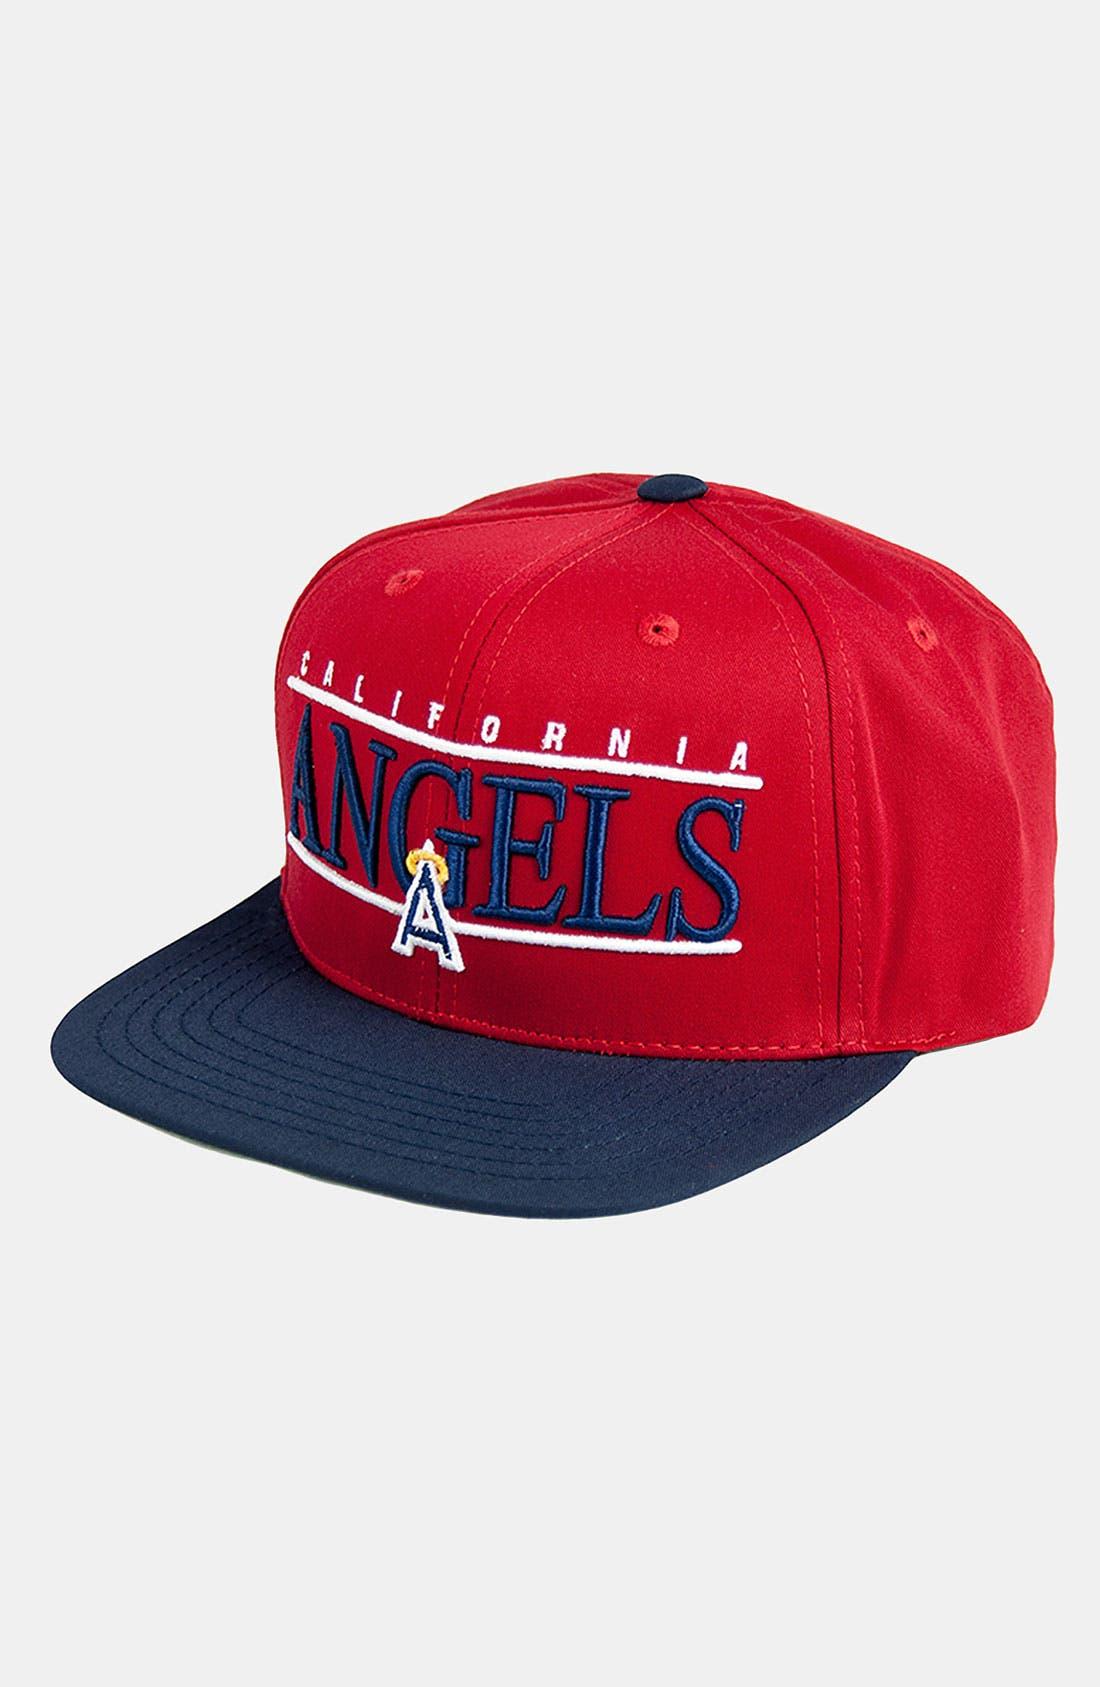 Main Image - American Needle 'Los Angeles Angels of Anaheim - Nineties' Twill Snapback Baseball Cap